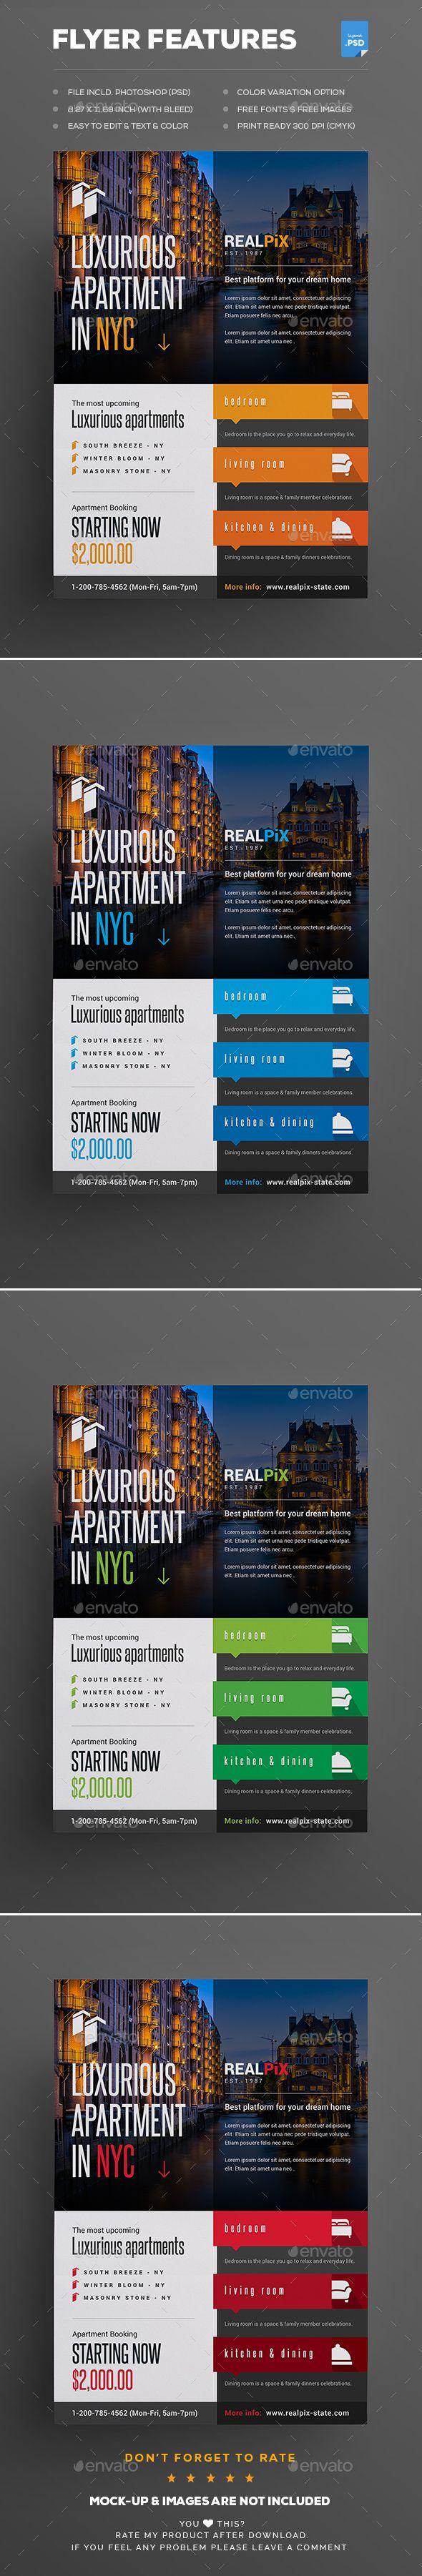 Best 25 Real estate flyers ideas on Pinterest